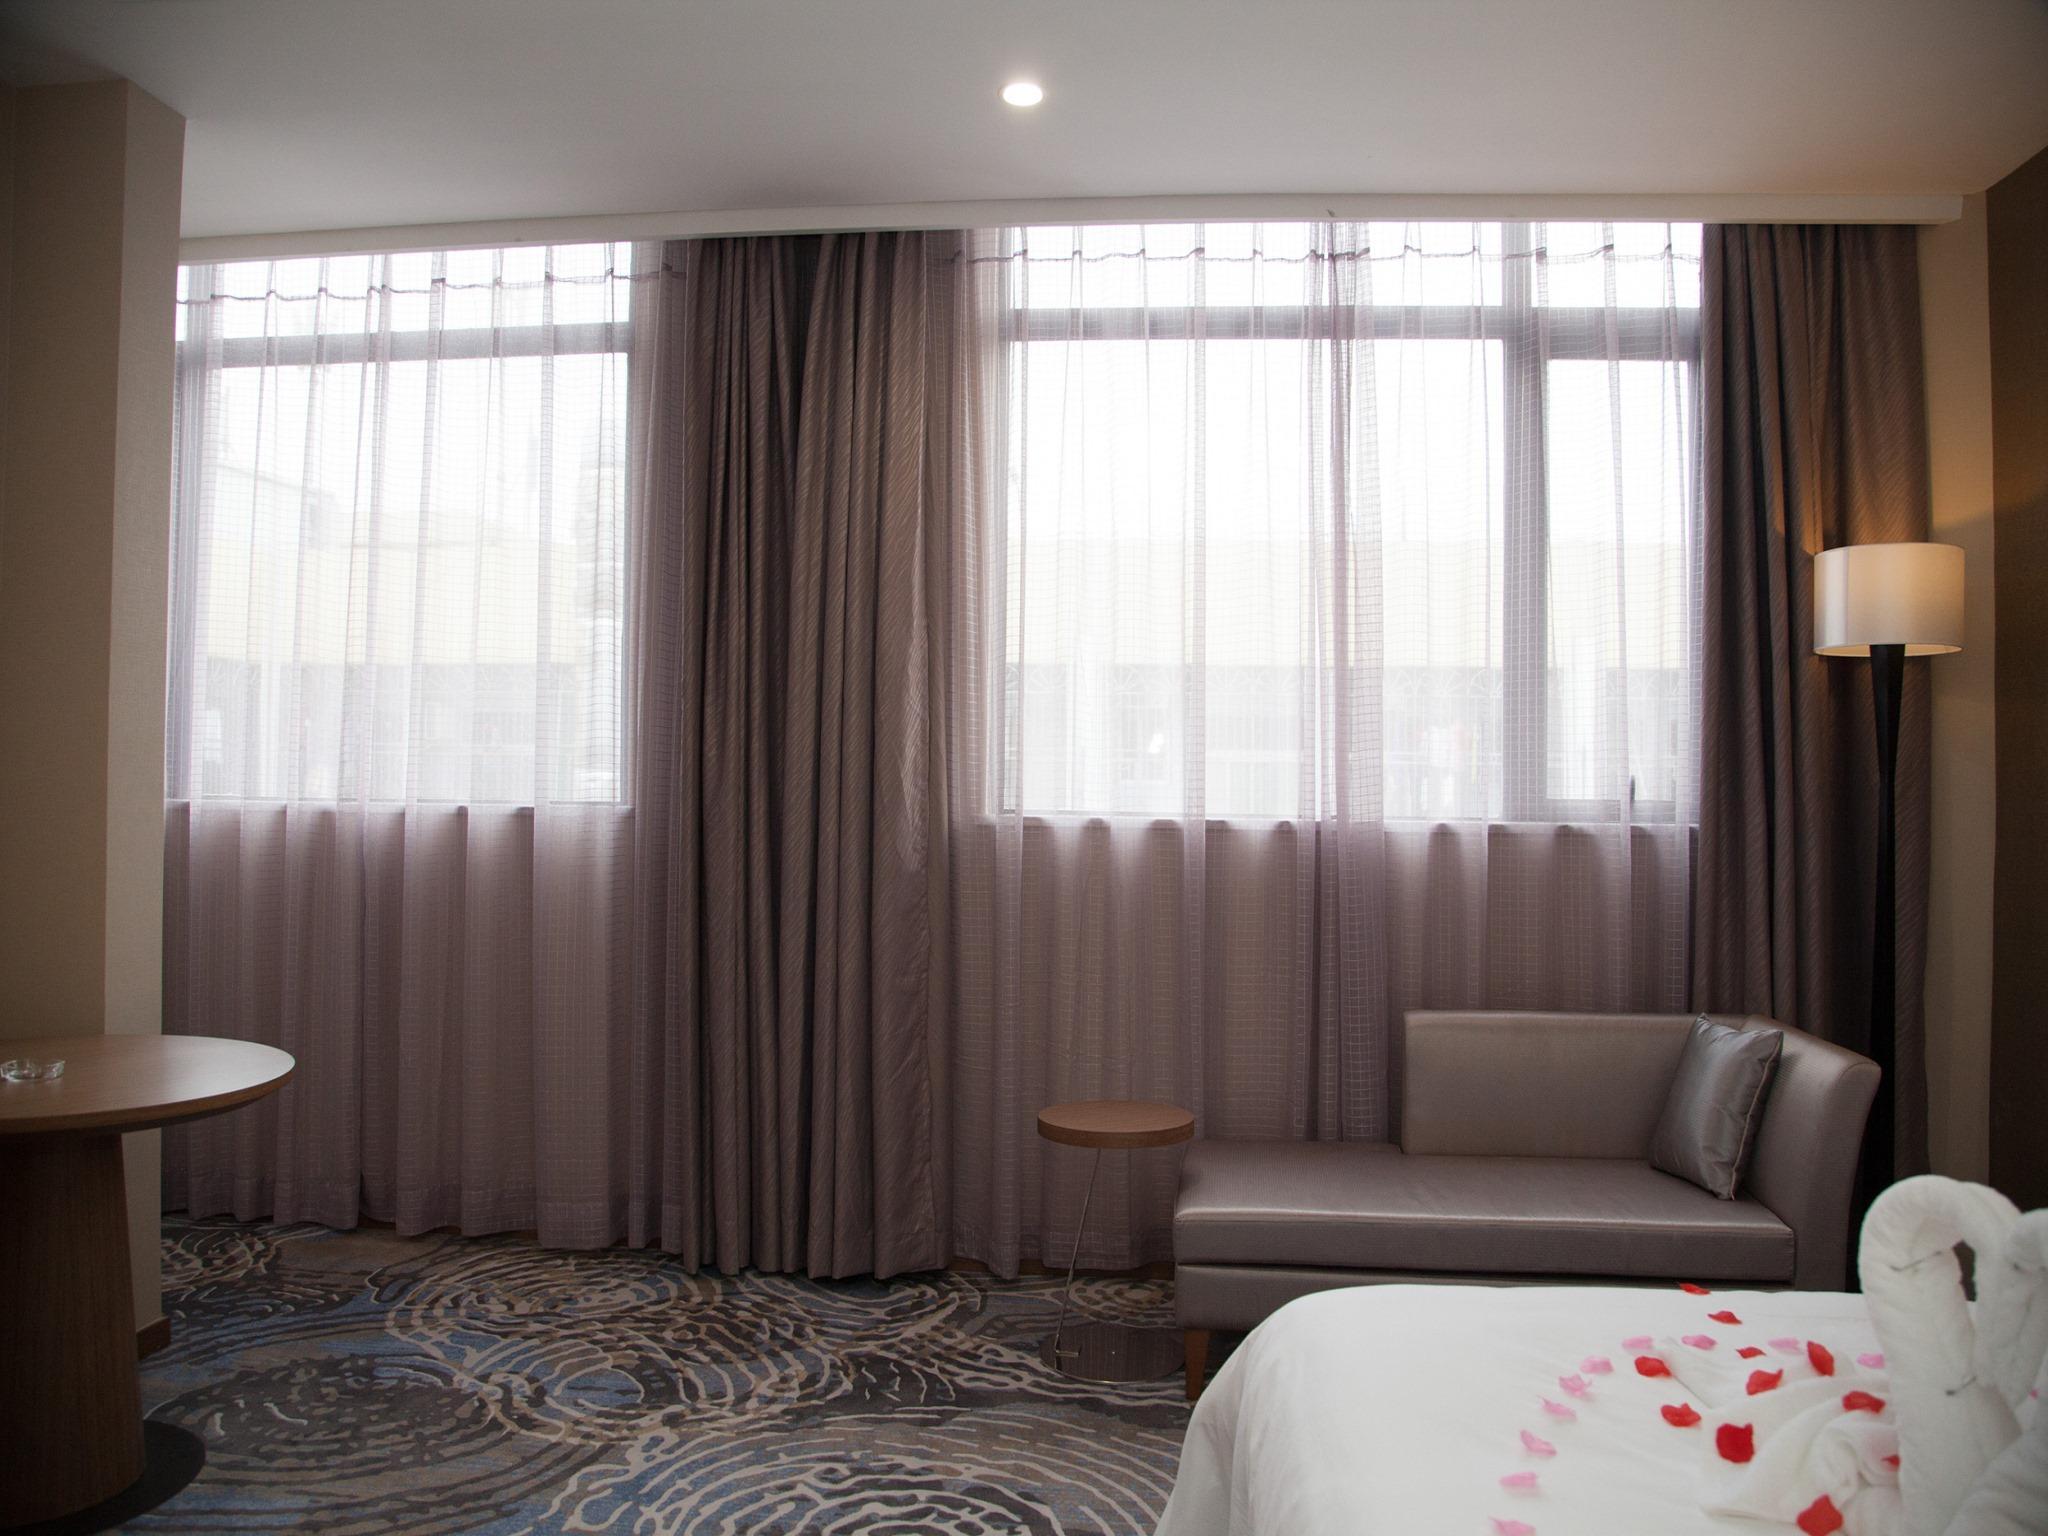 Qianhai Holiday Hotel Shenzhen China